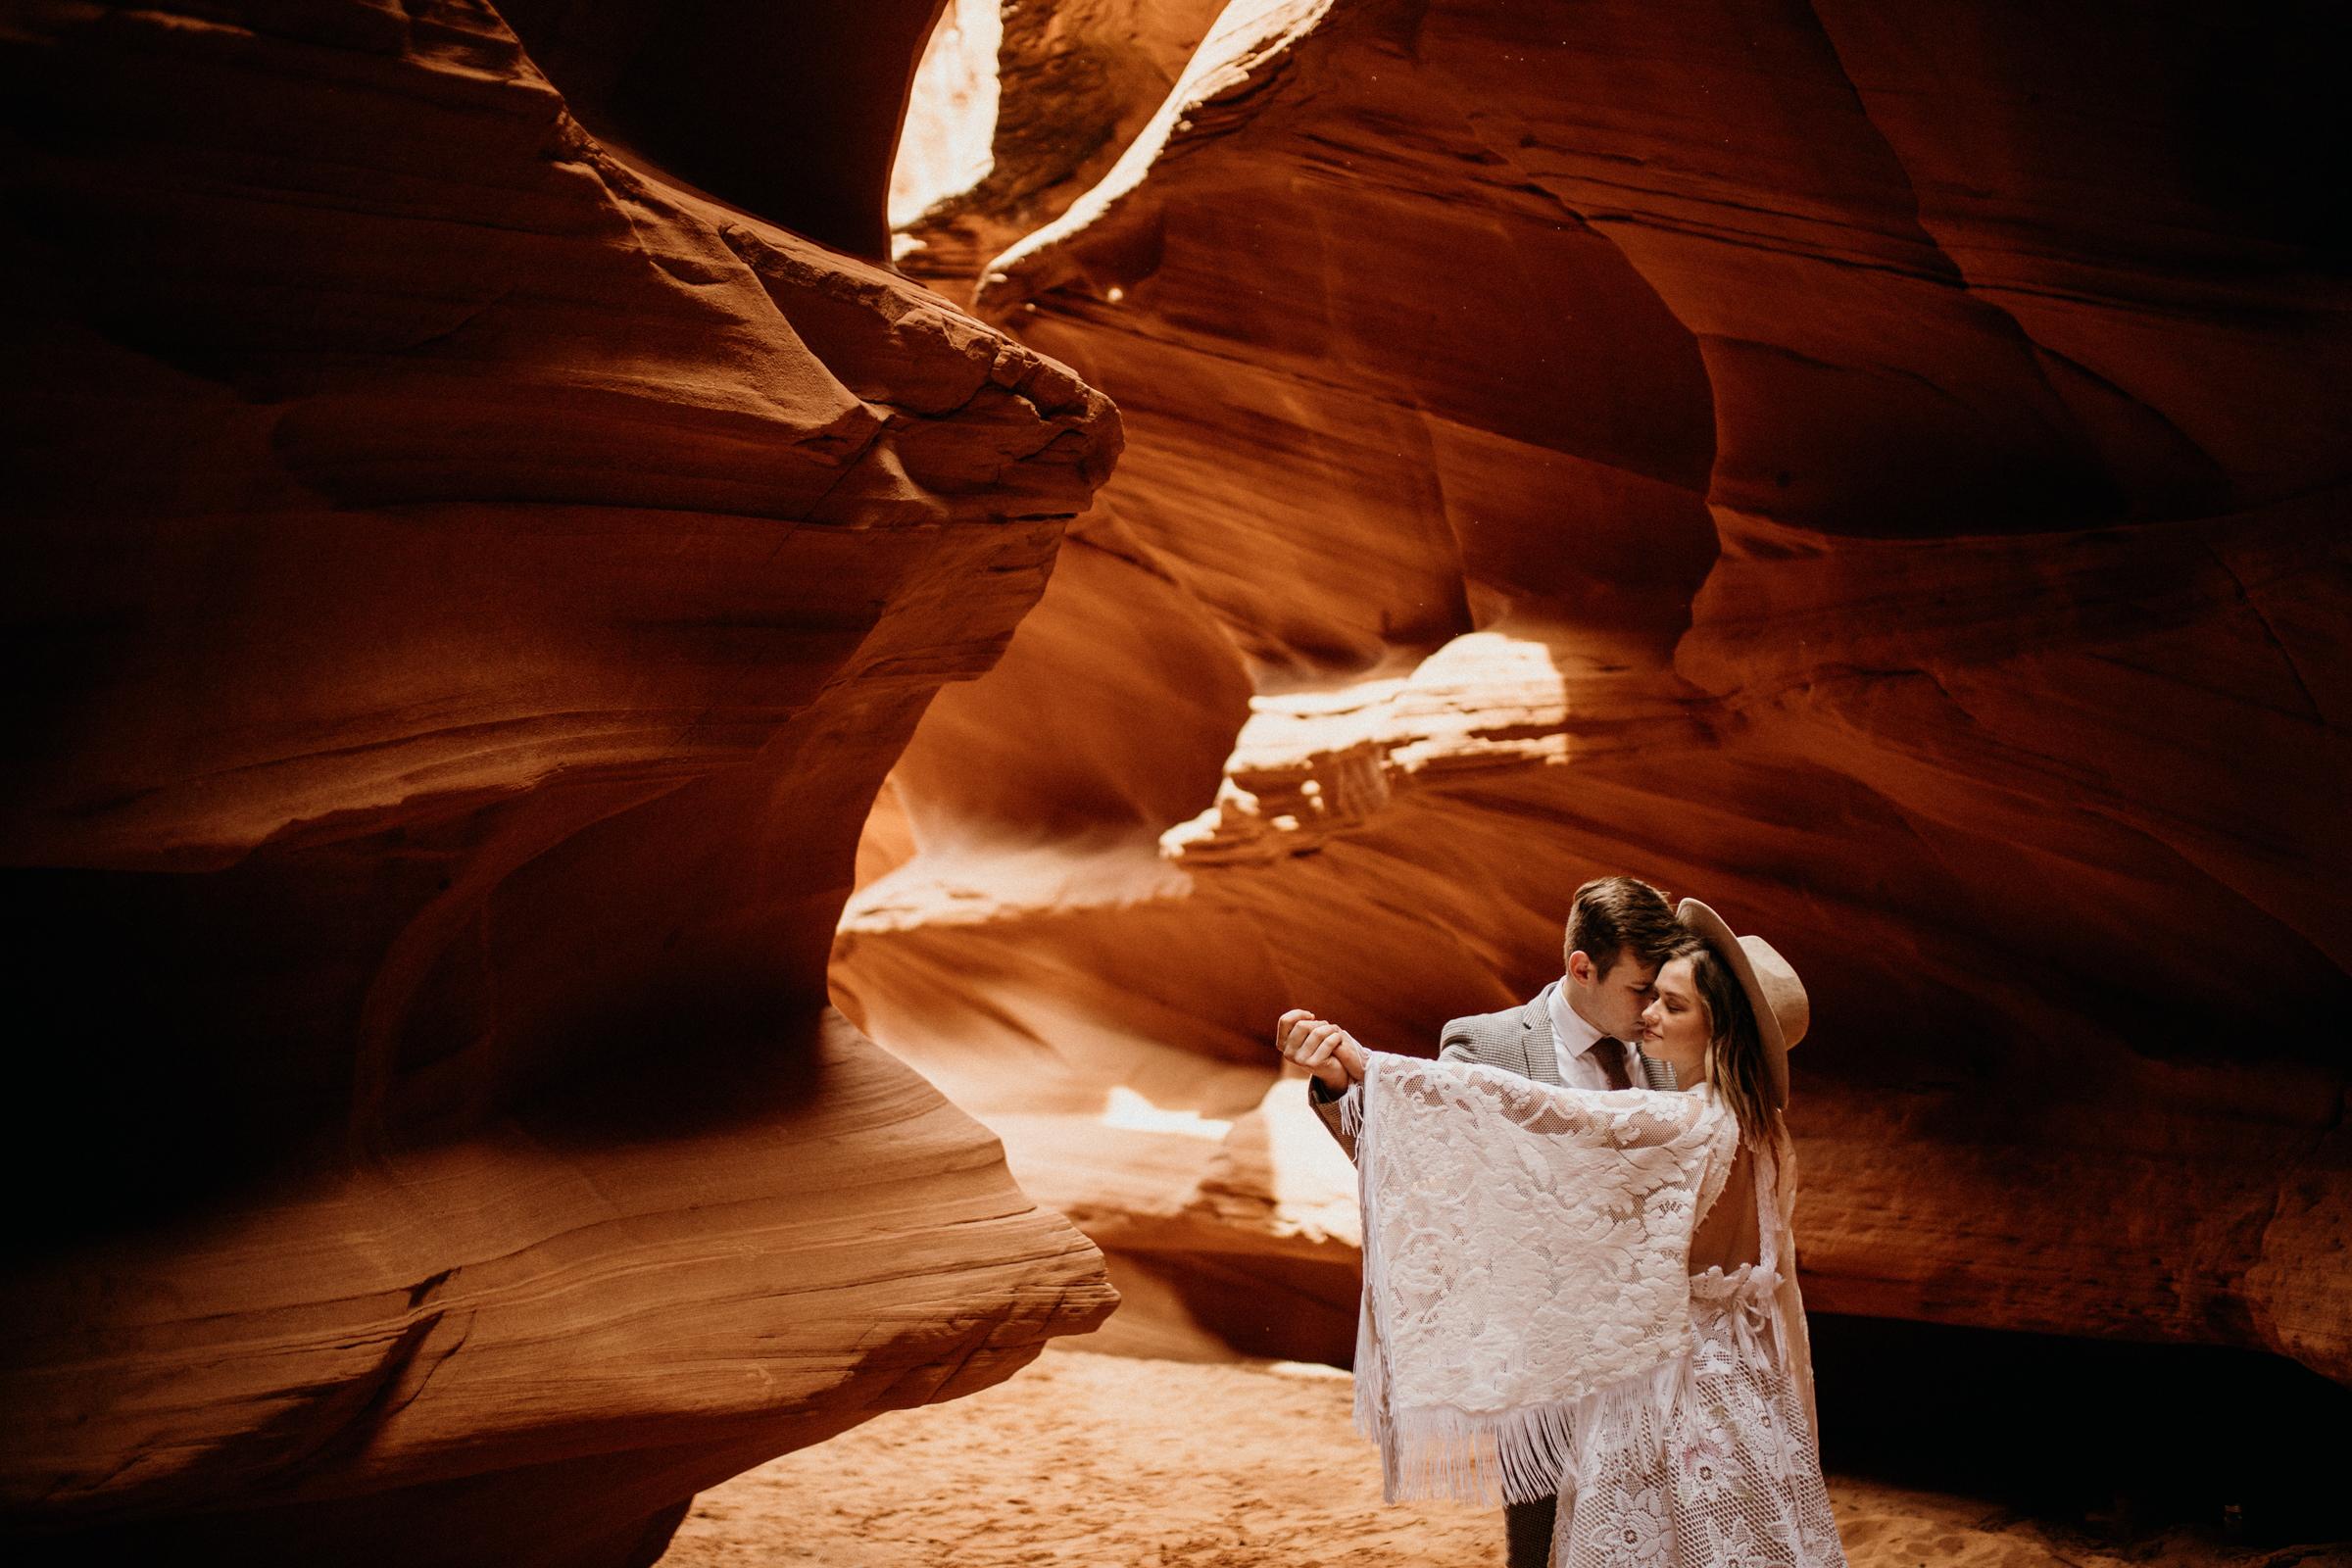 wedding-adventure-in-an-arizona-canyon.jpg